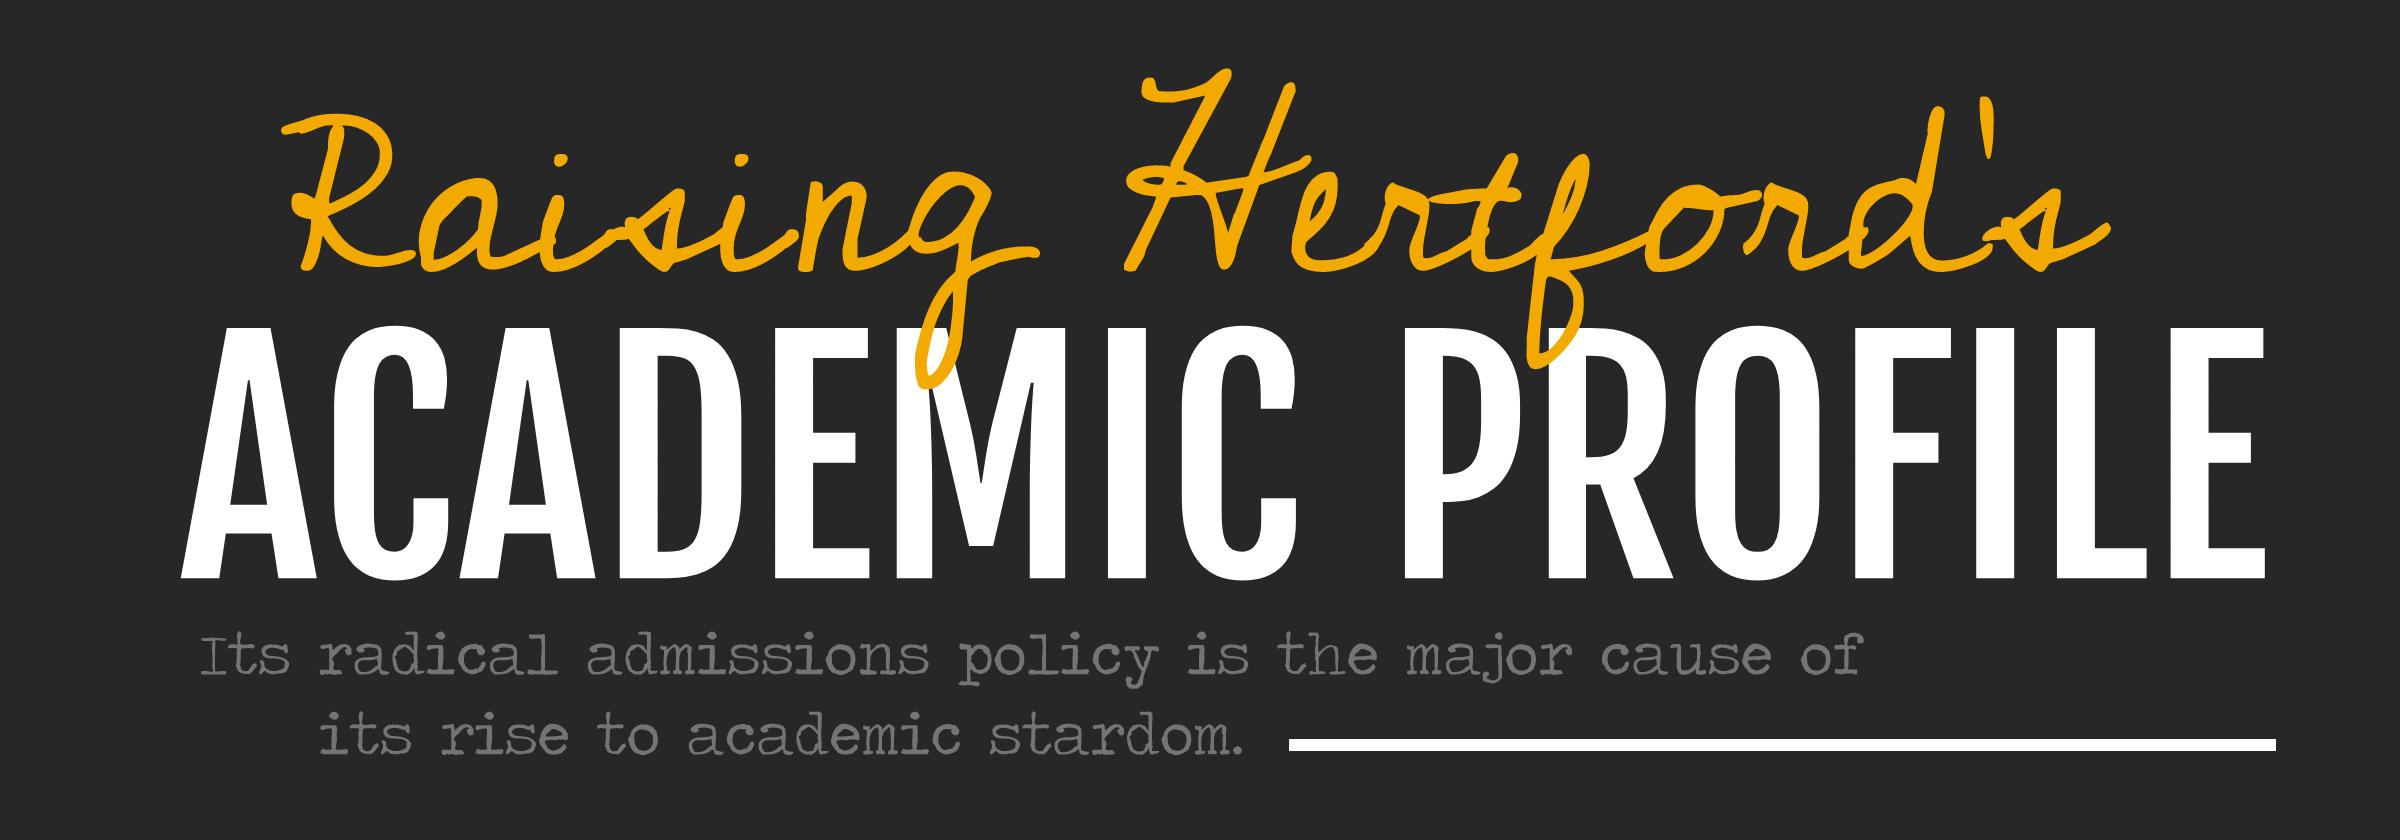 Raising Hertford's academic profile